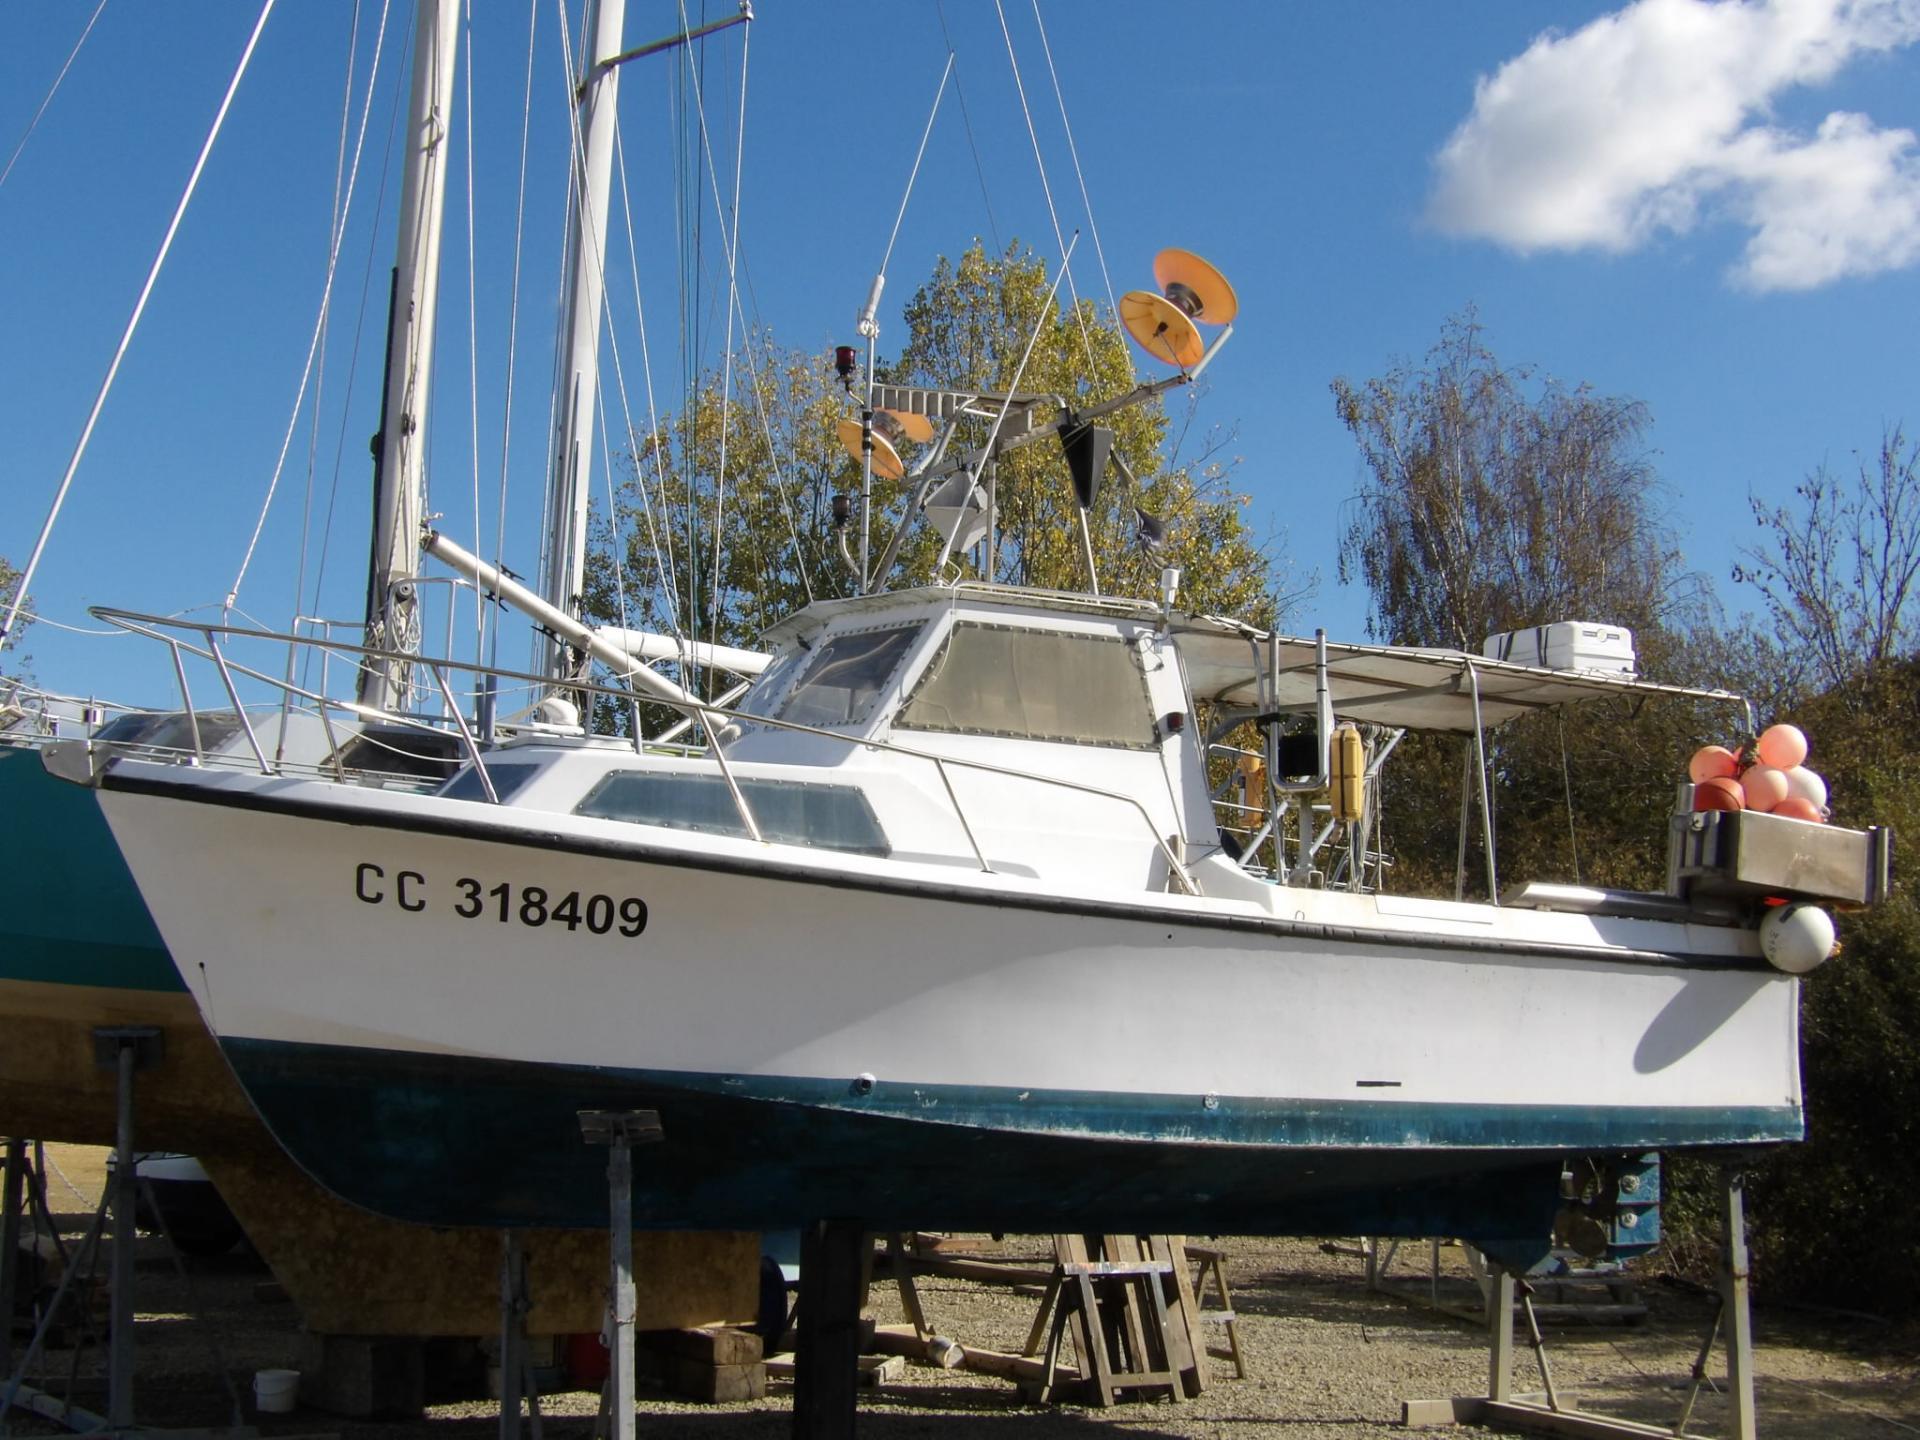 201015 enzo cc318409 au sec a